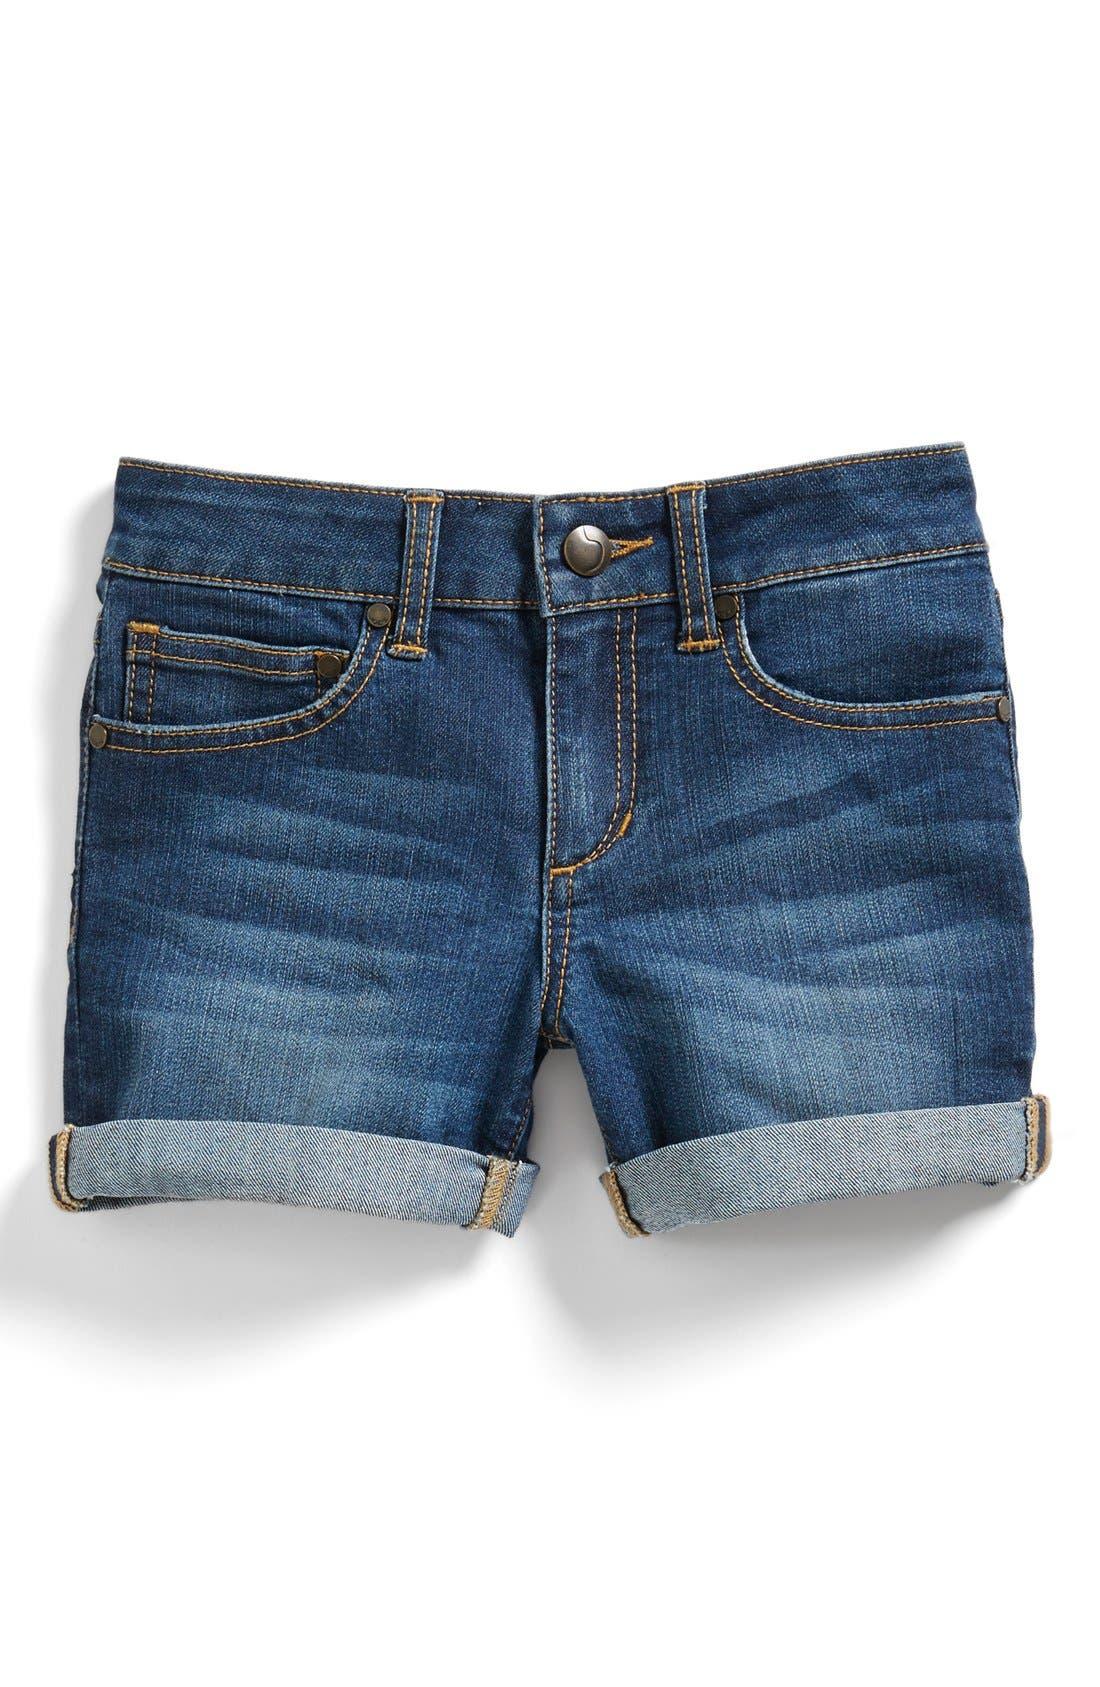 Alternate Image 1 Selected - Joe's Classic Cuff Denim Shorts (Big Girls)